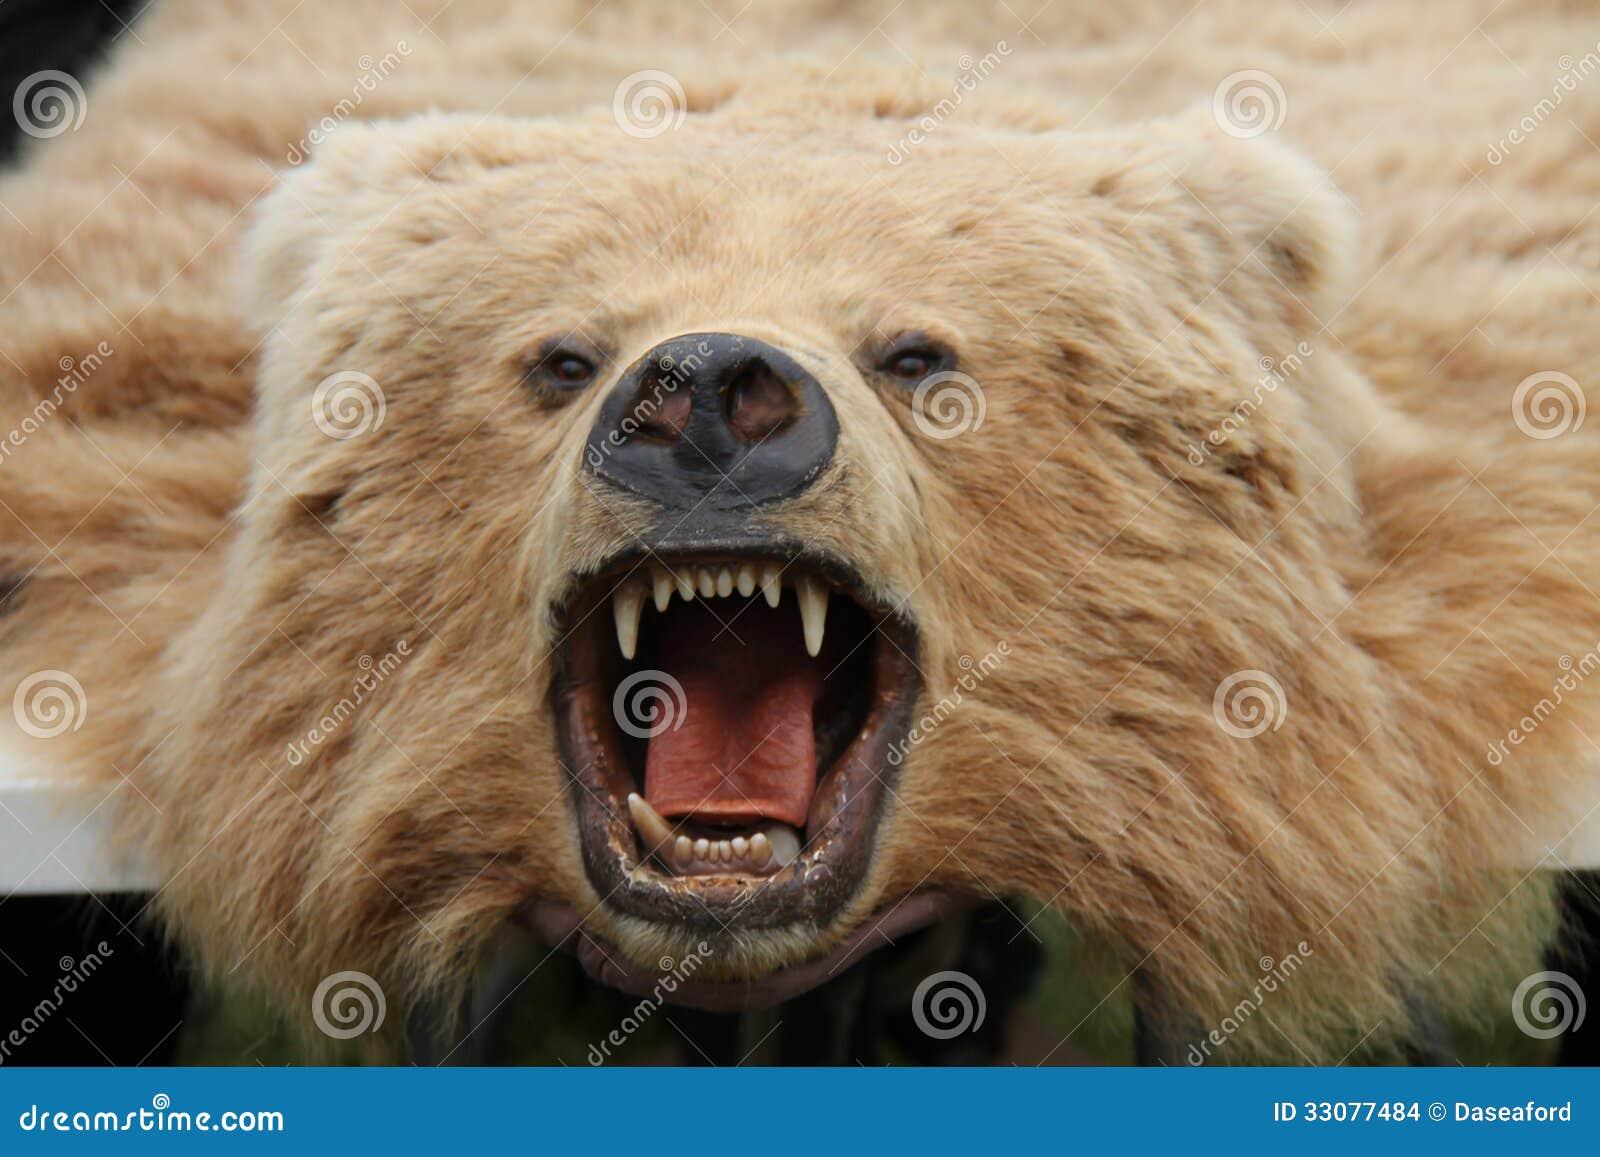 Bear Skin Rug. Stock Images